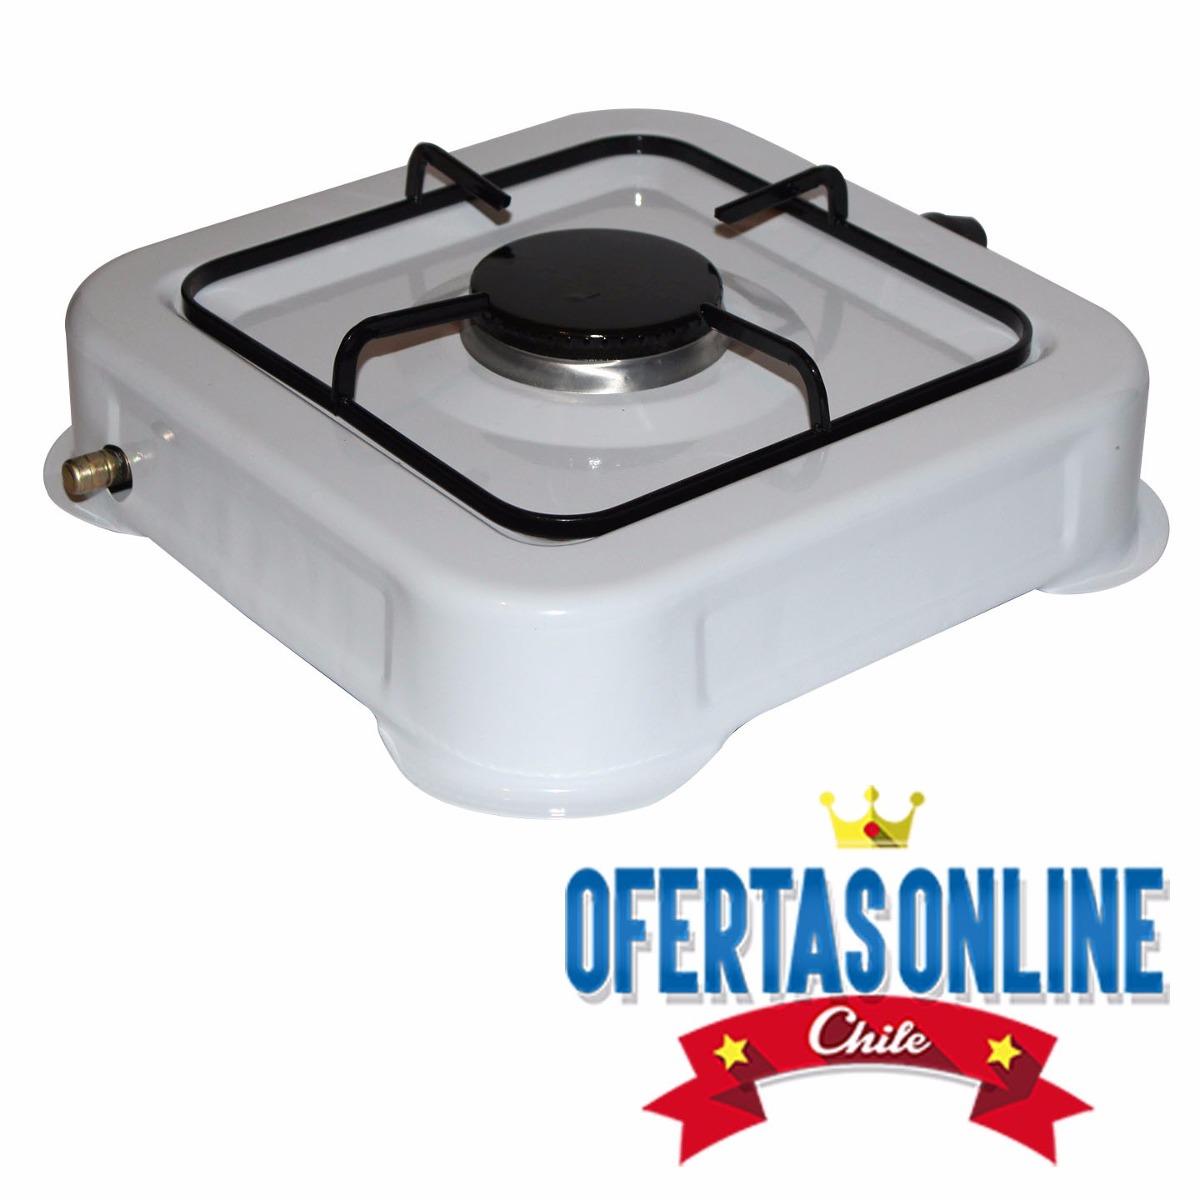 Cocina cocinilla encimera a gas licuado 1 quemador ofc Cocinilla a gas 1 plato